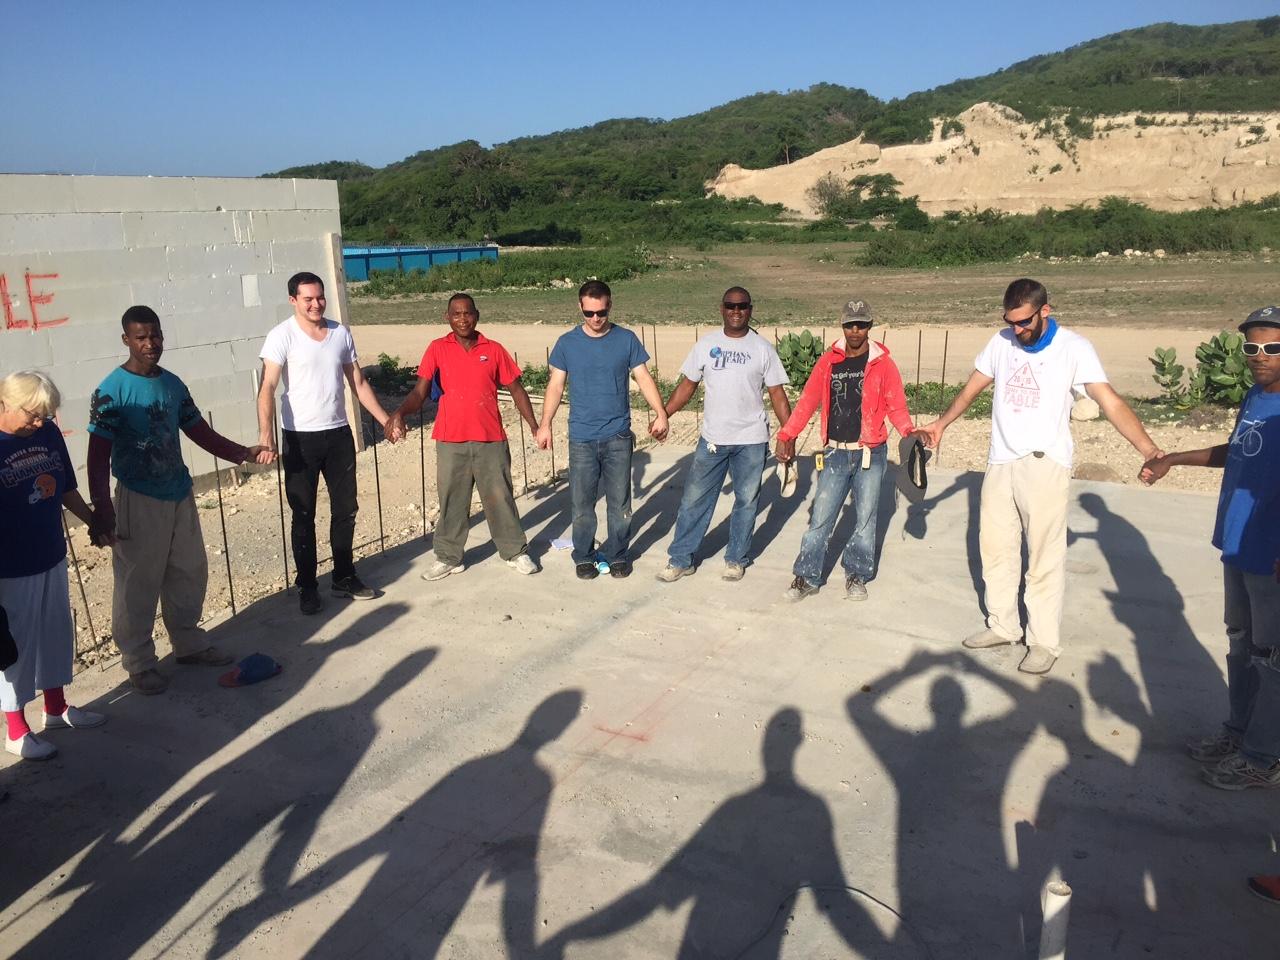 Dominican Republic, September 12th-18th, 2015; Trip Update 3